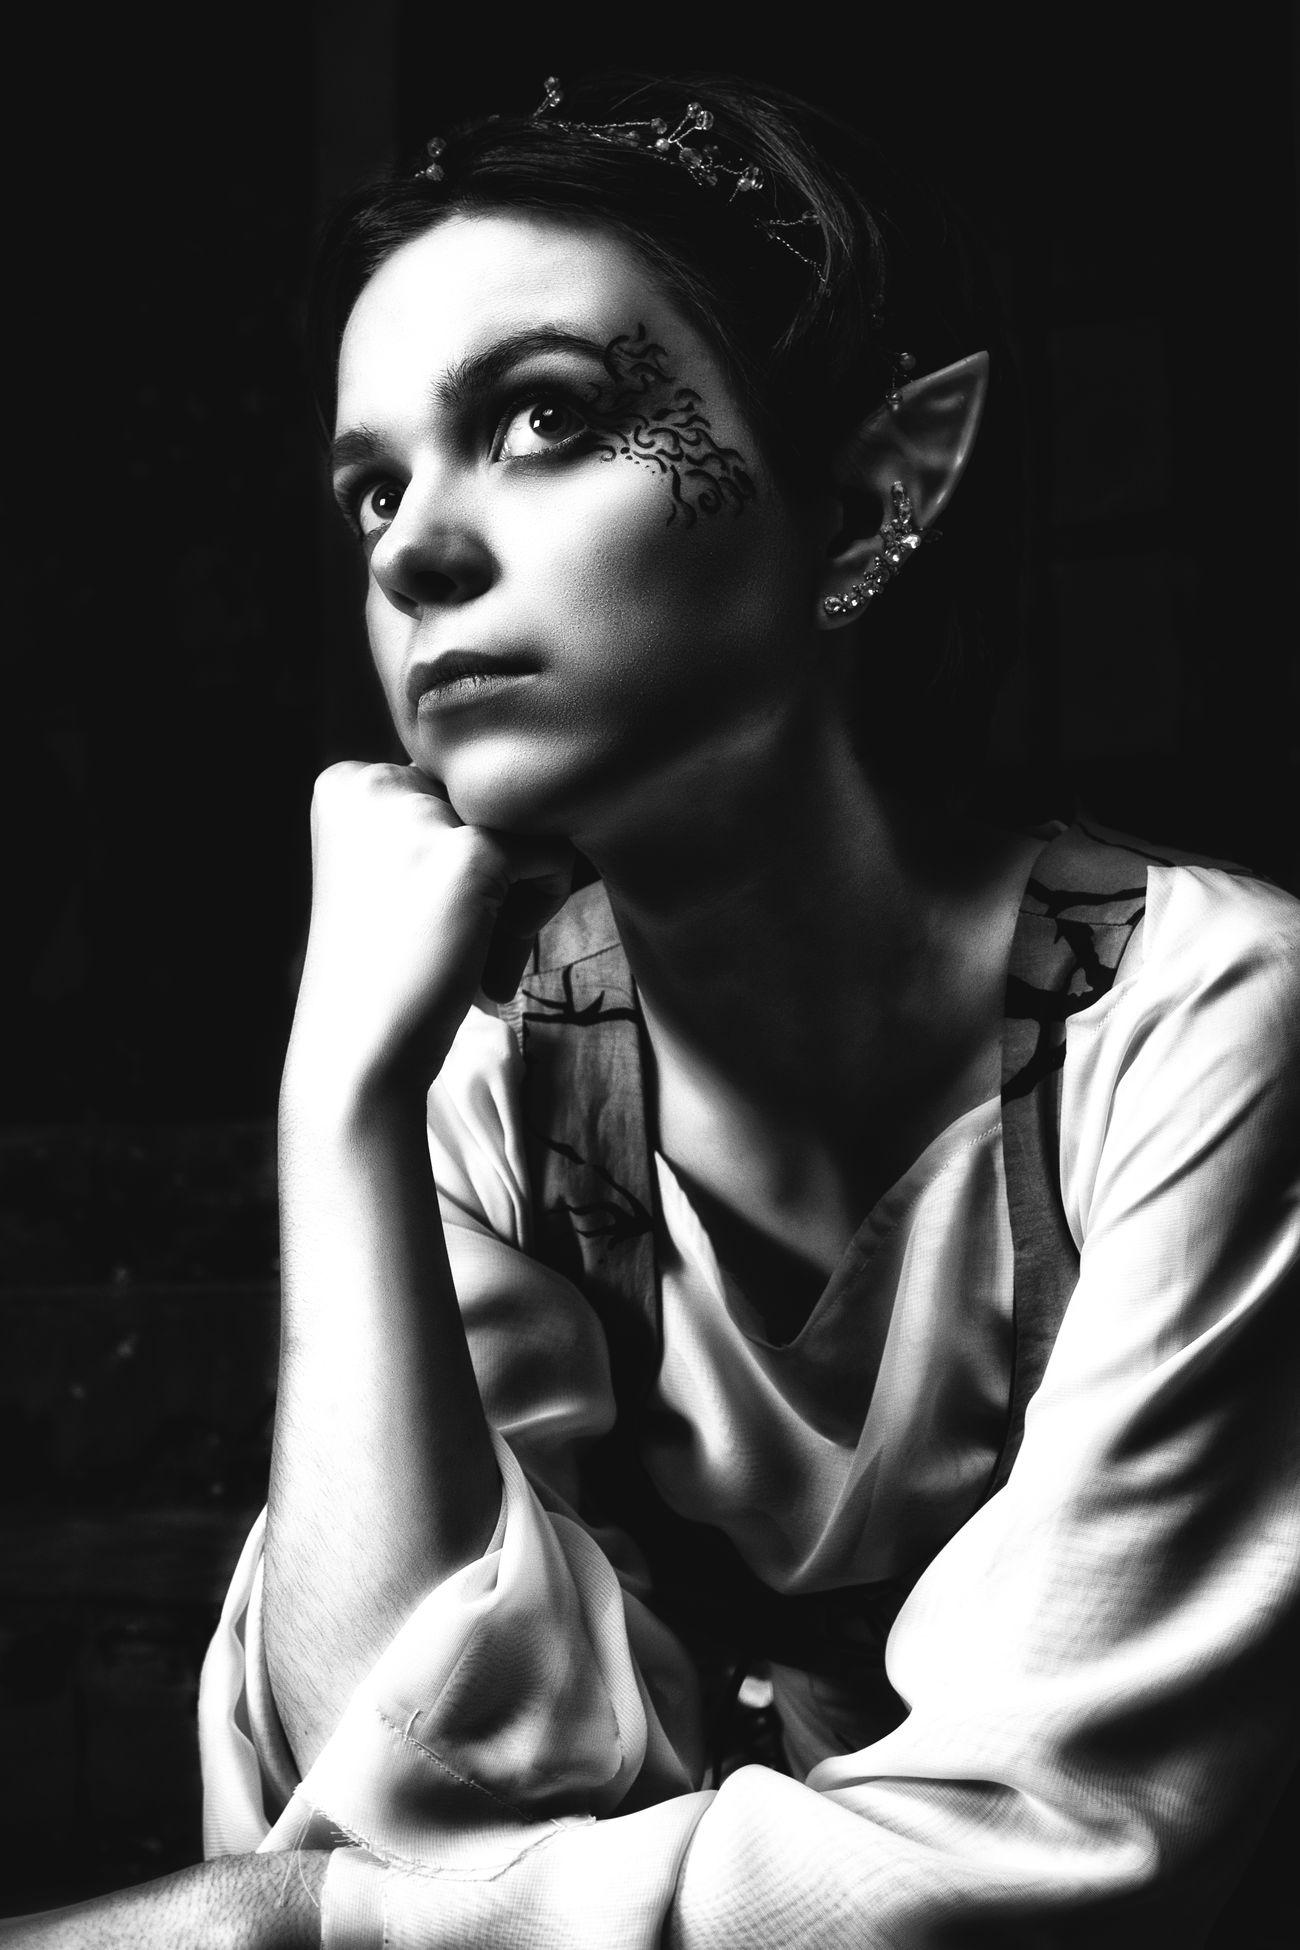 Blackandwhite Elf Elf Fantasy Fair Tales